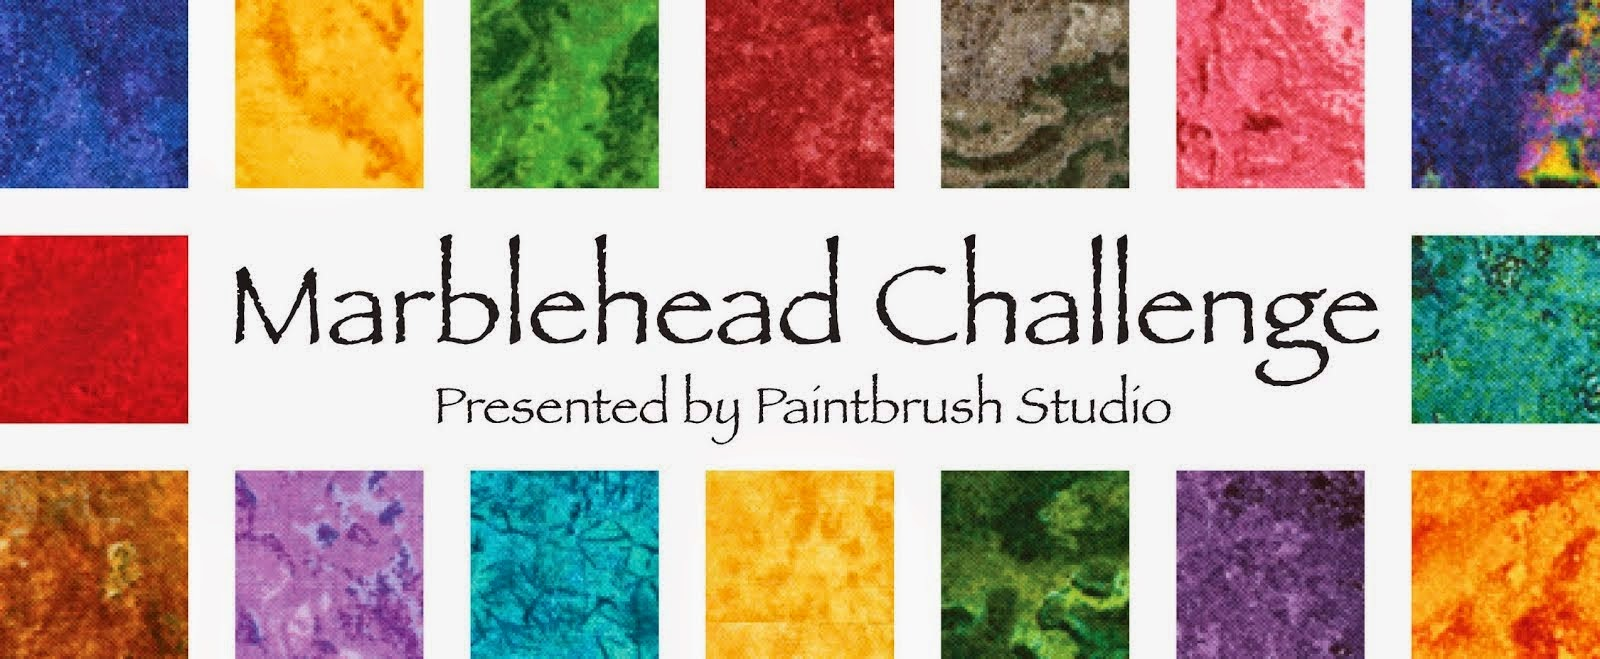 Marblehead Challenge 2014